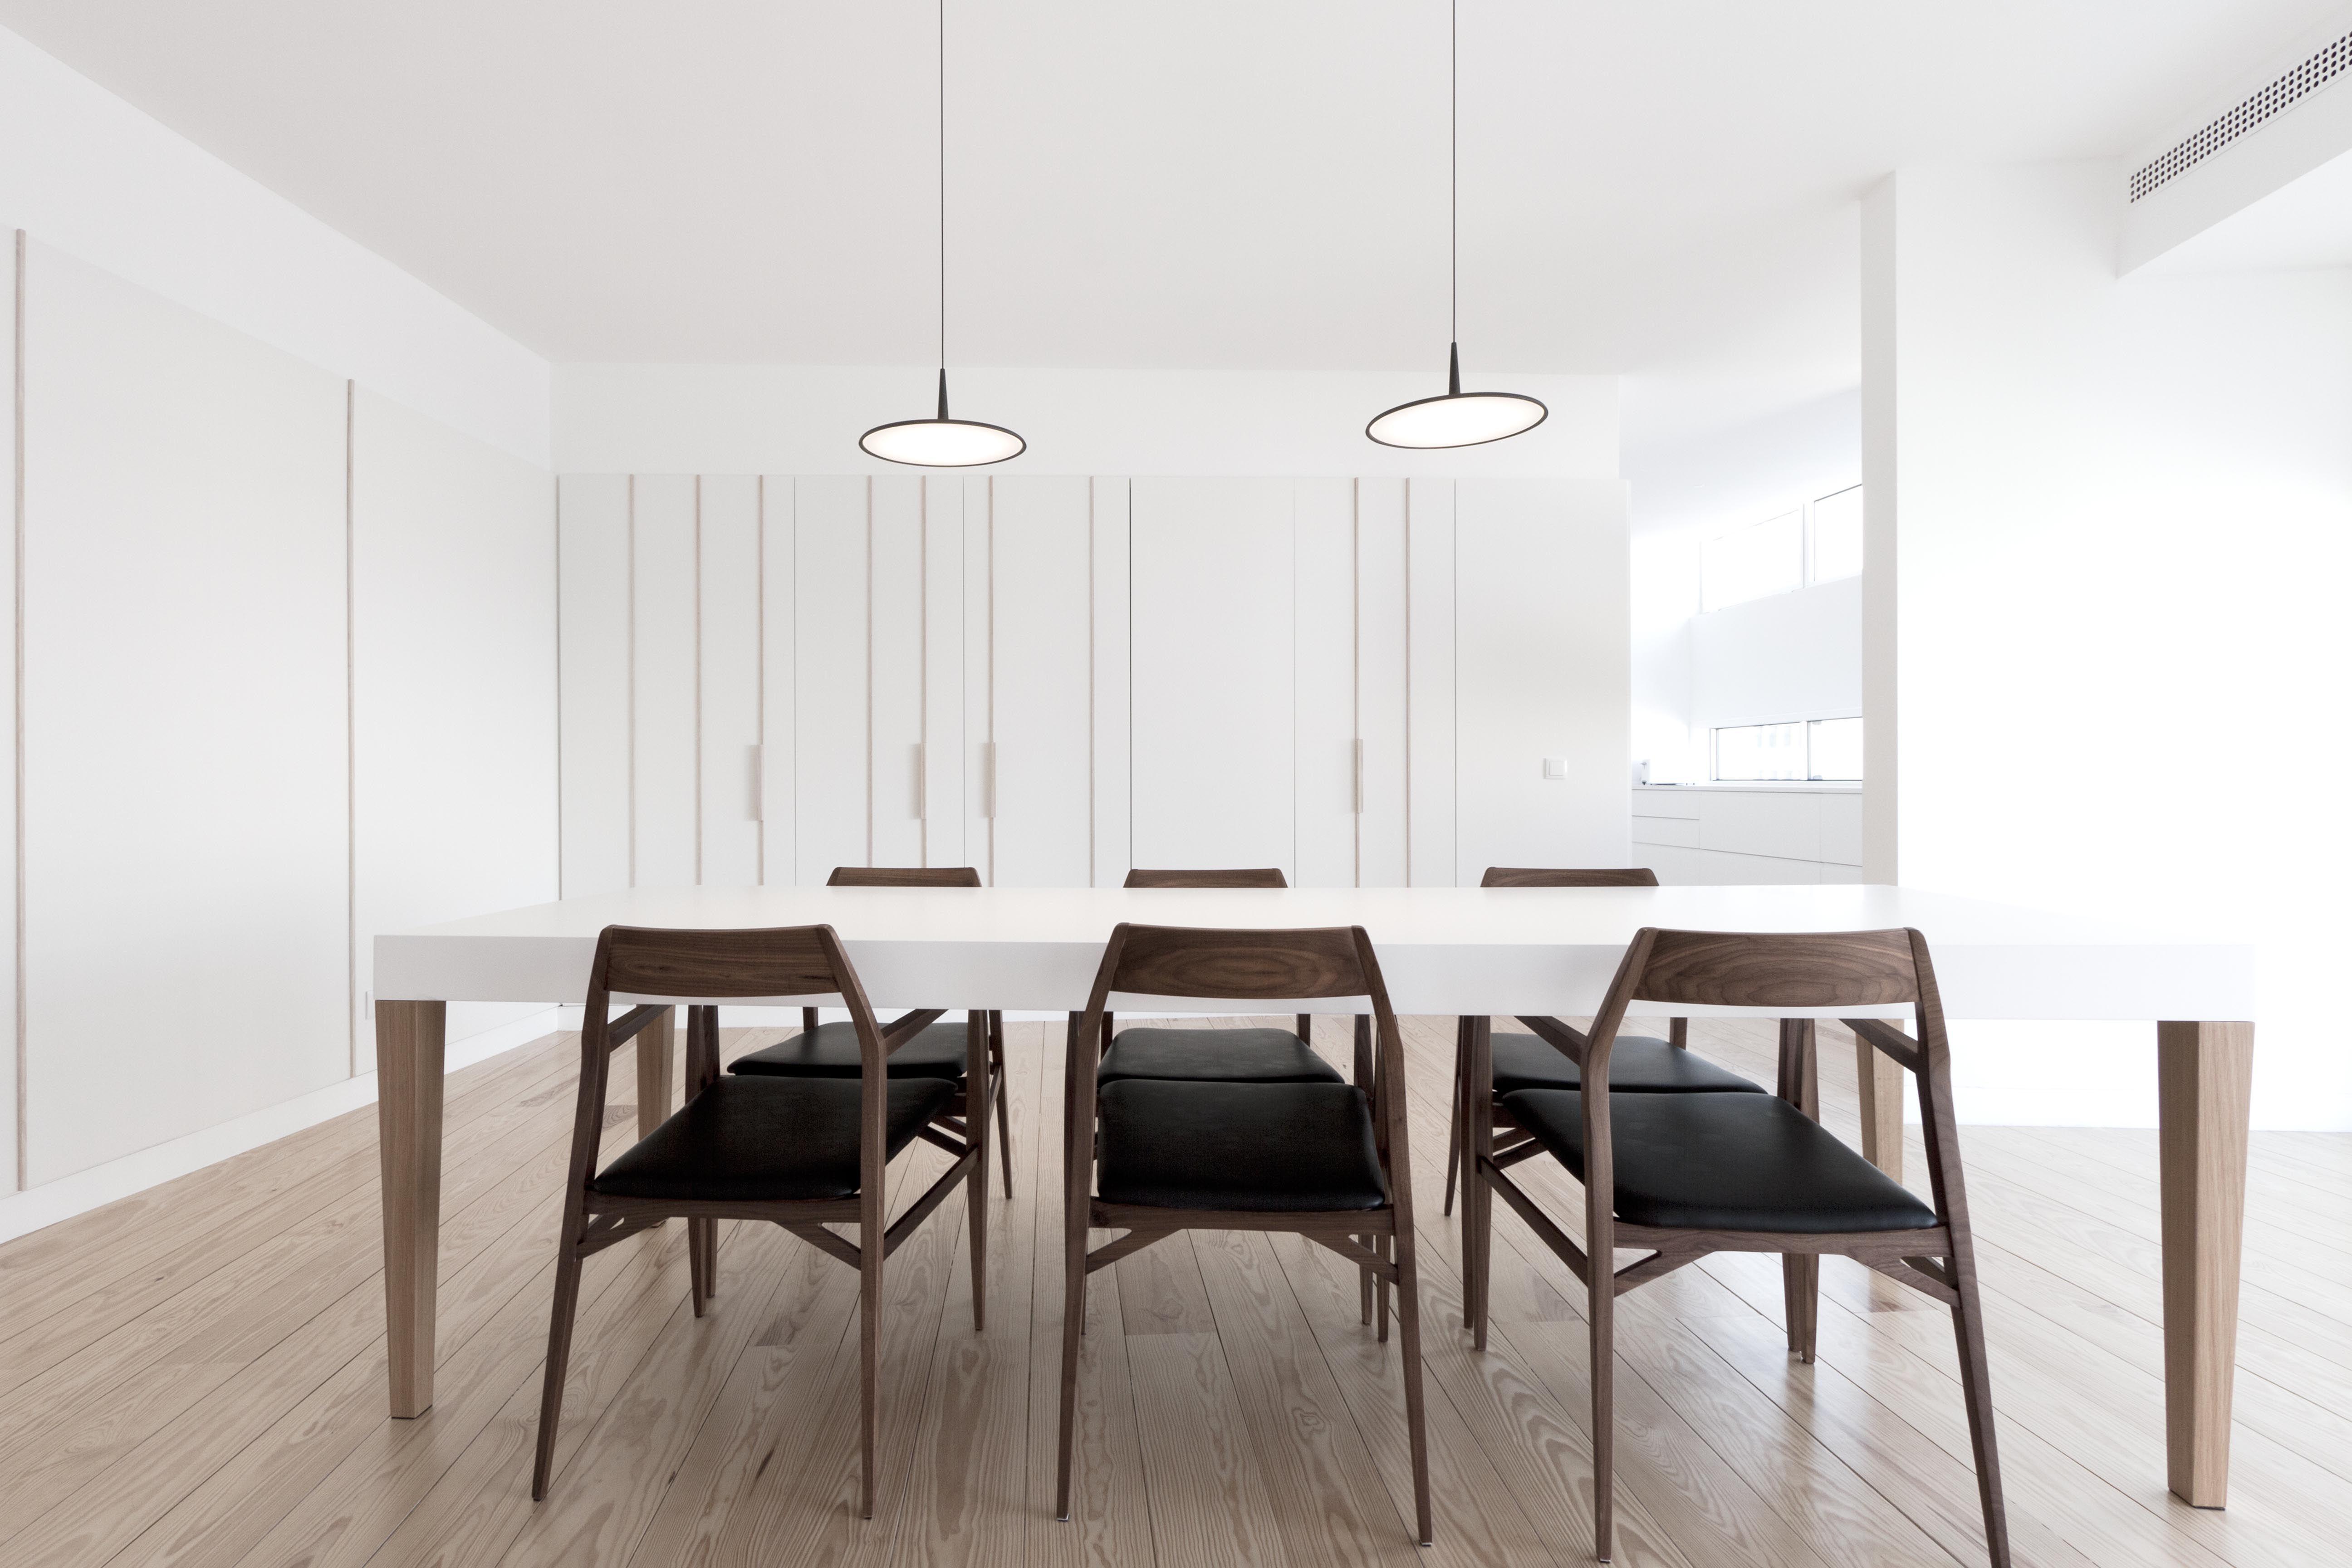 appartamento roma Dining table design, Contemporary home